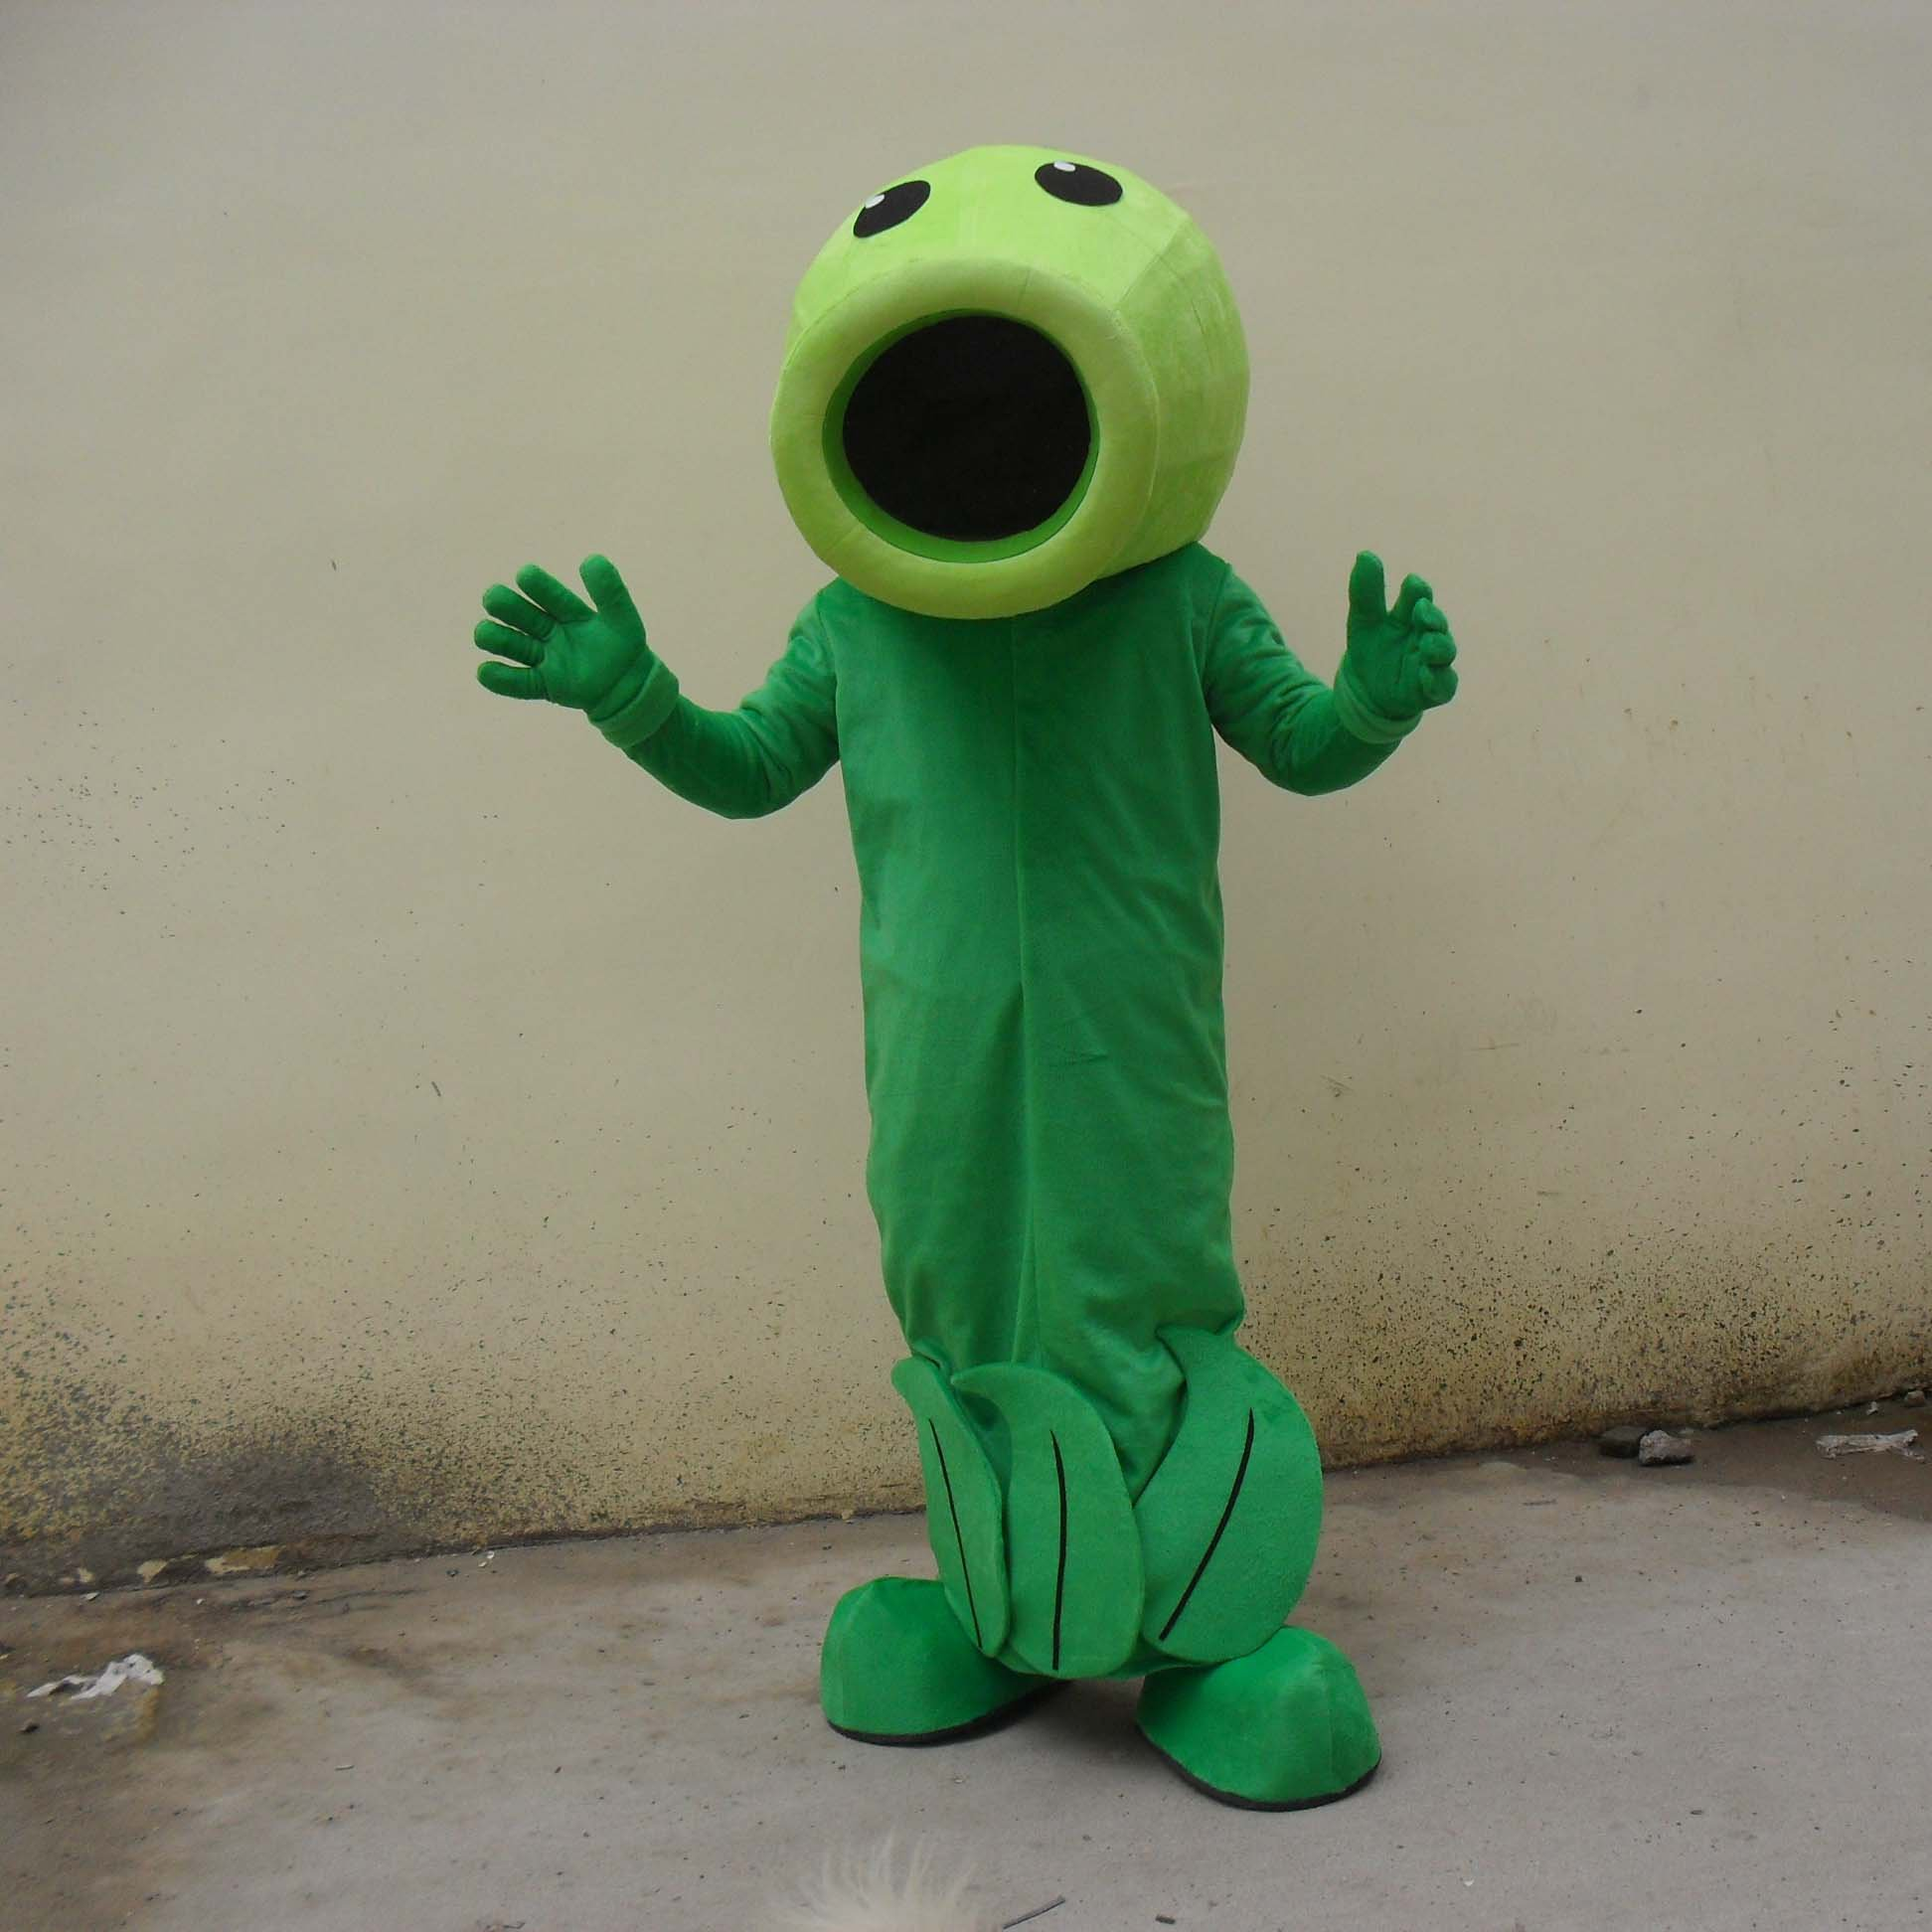 Pea Pea Walking Cartoon Doll Clothing Cartoon Show Props Cartoon Dolls Clothing Peas Mascot Costume